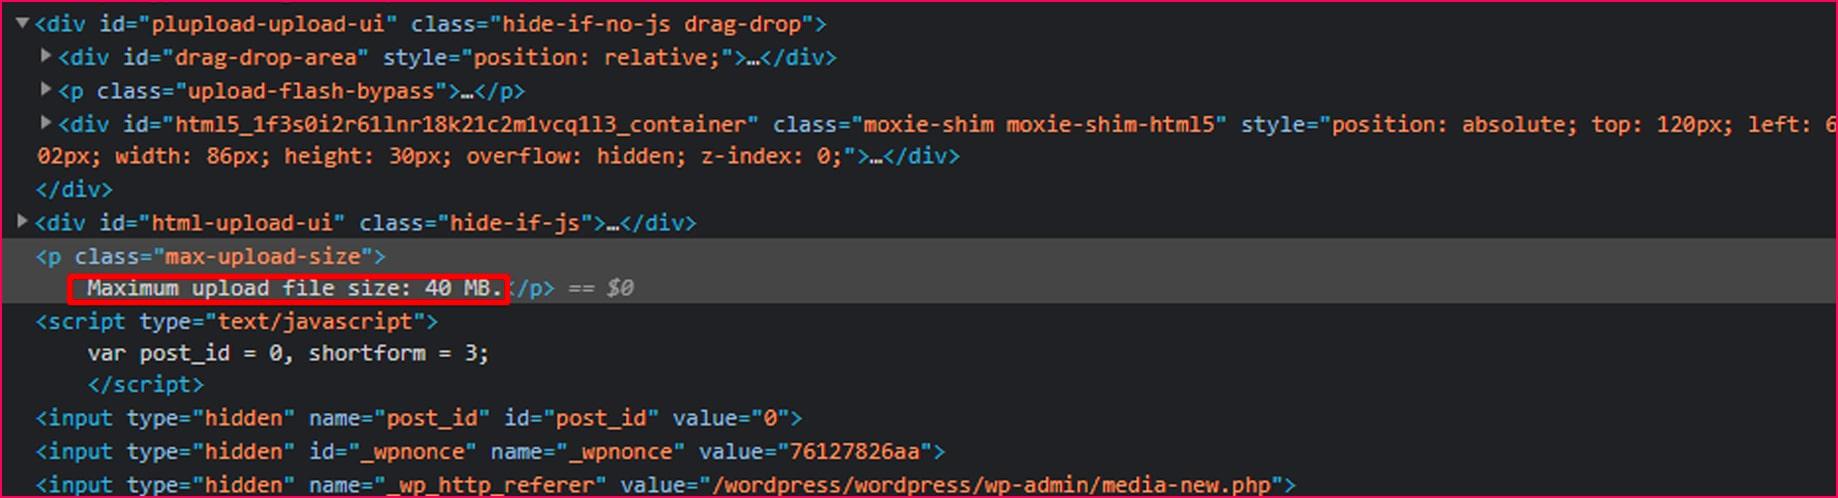 How to Increase WordPress Memory Limit_Wpmet_image 4